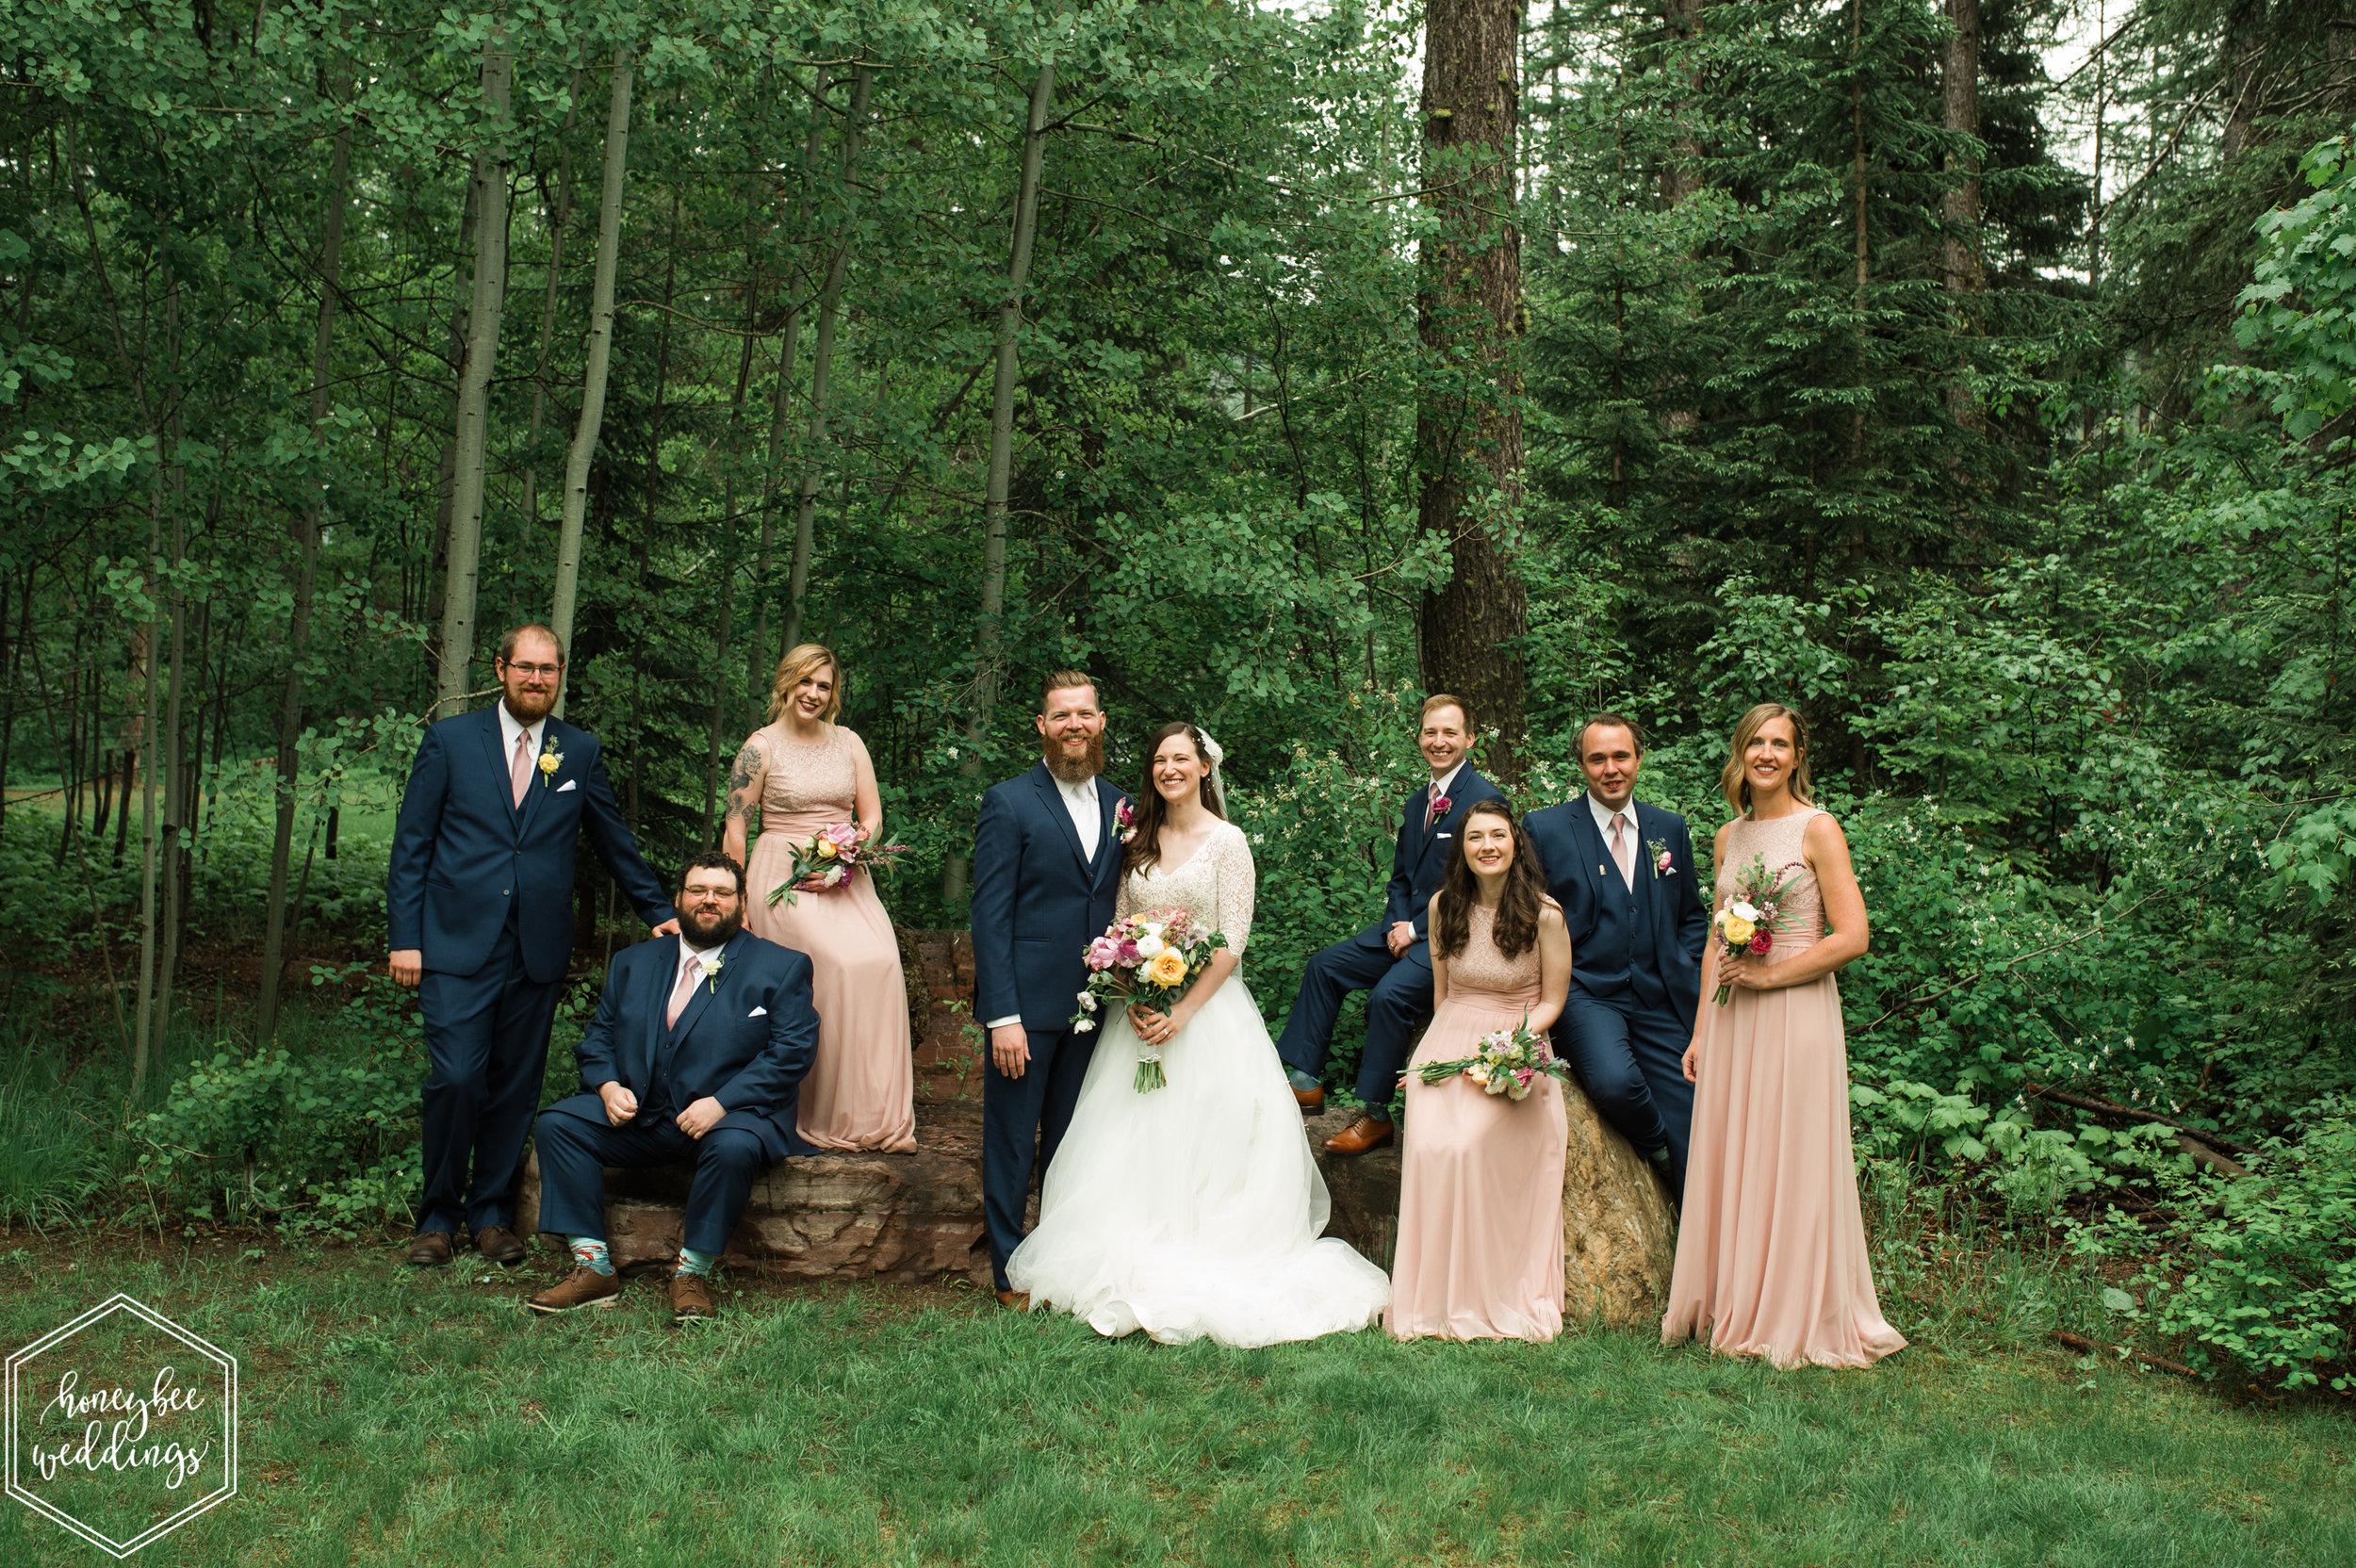 075Glacier National Park Wedding_Izaak Walton Inn Wedding_Honeybee Weddings_Norah & Kyle_June 08, 2019-669.jpg